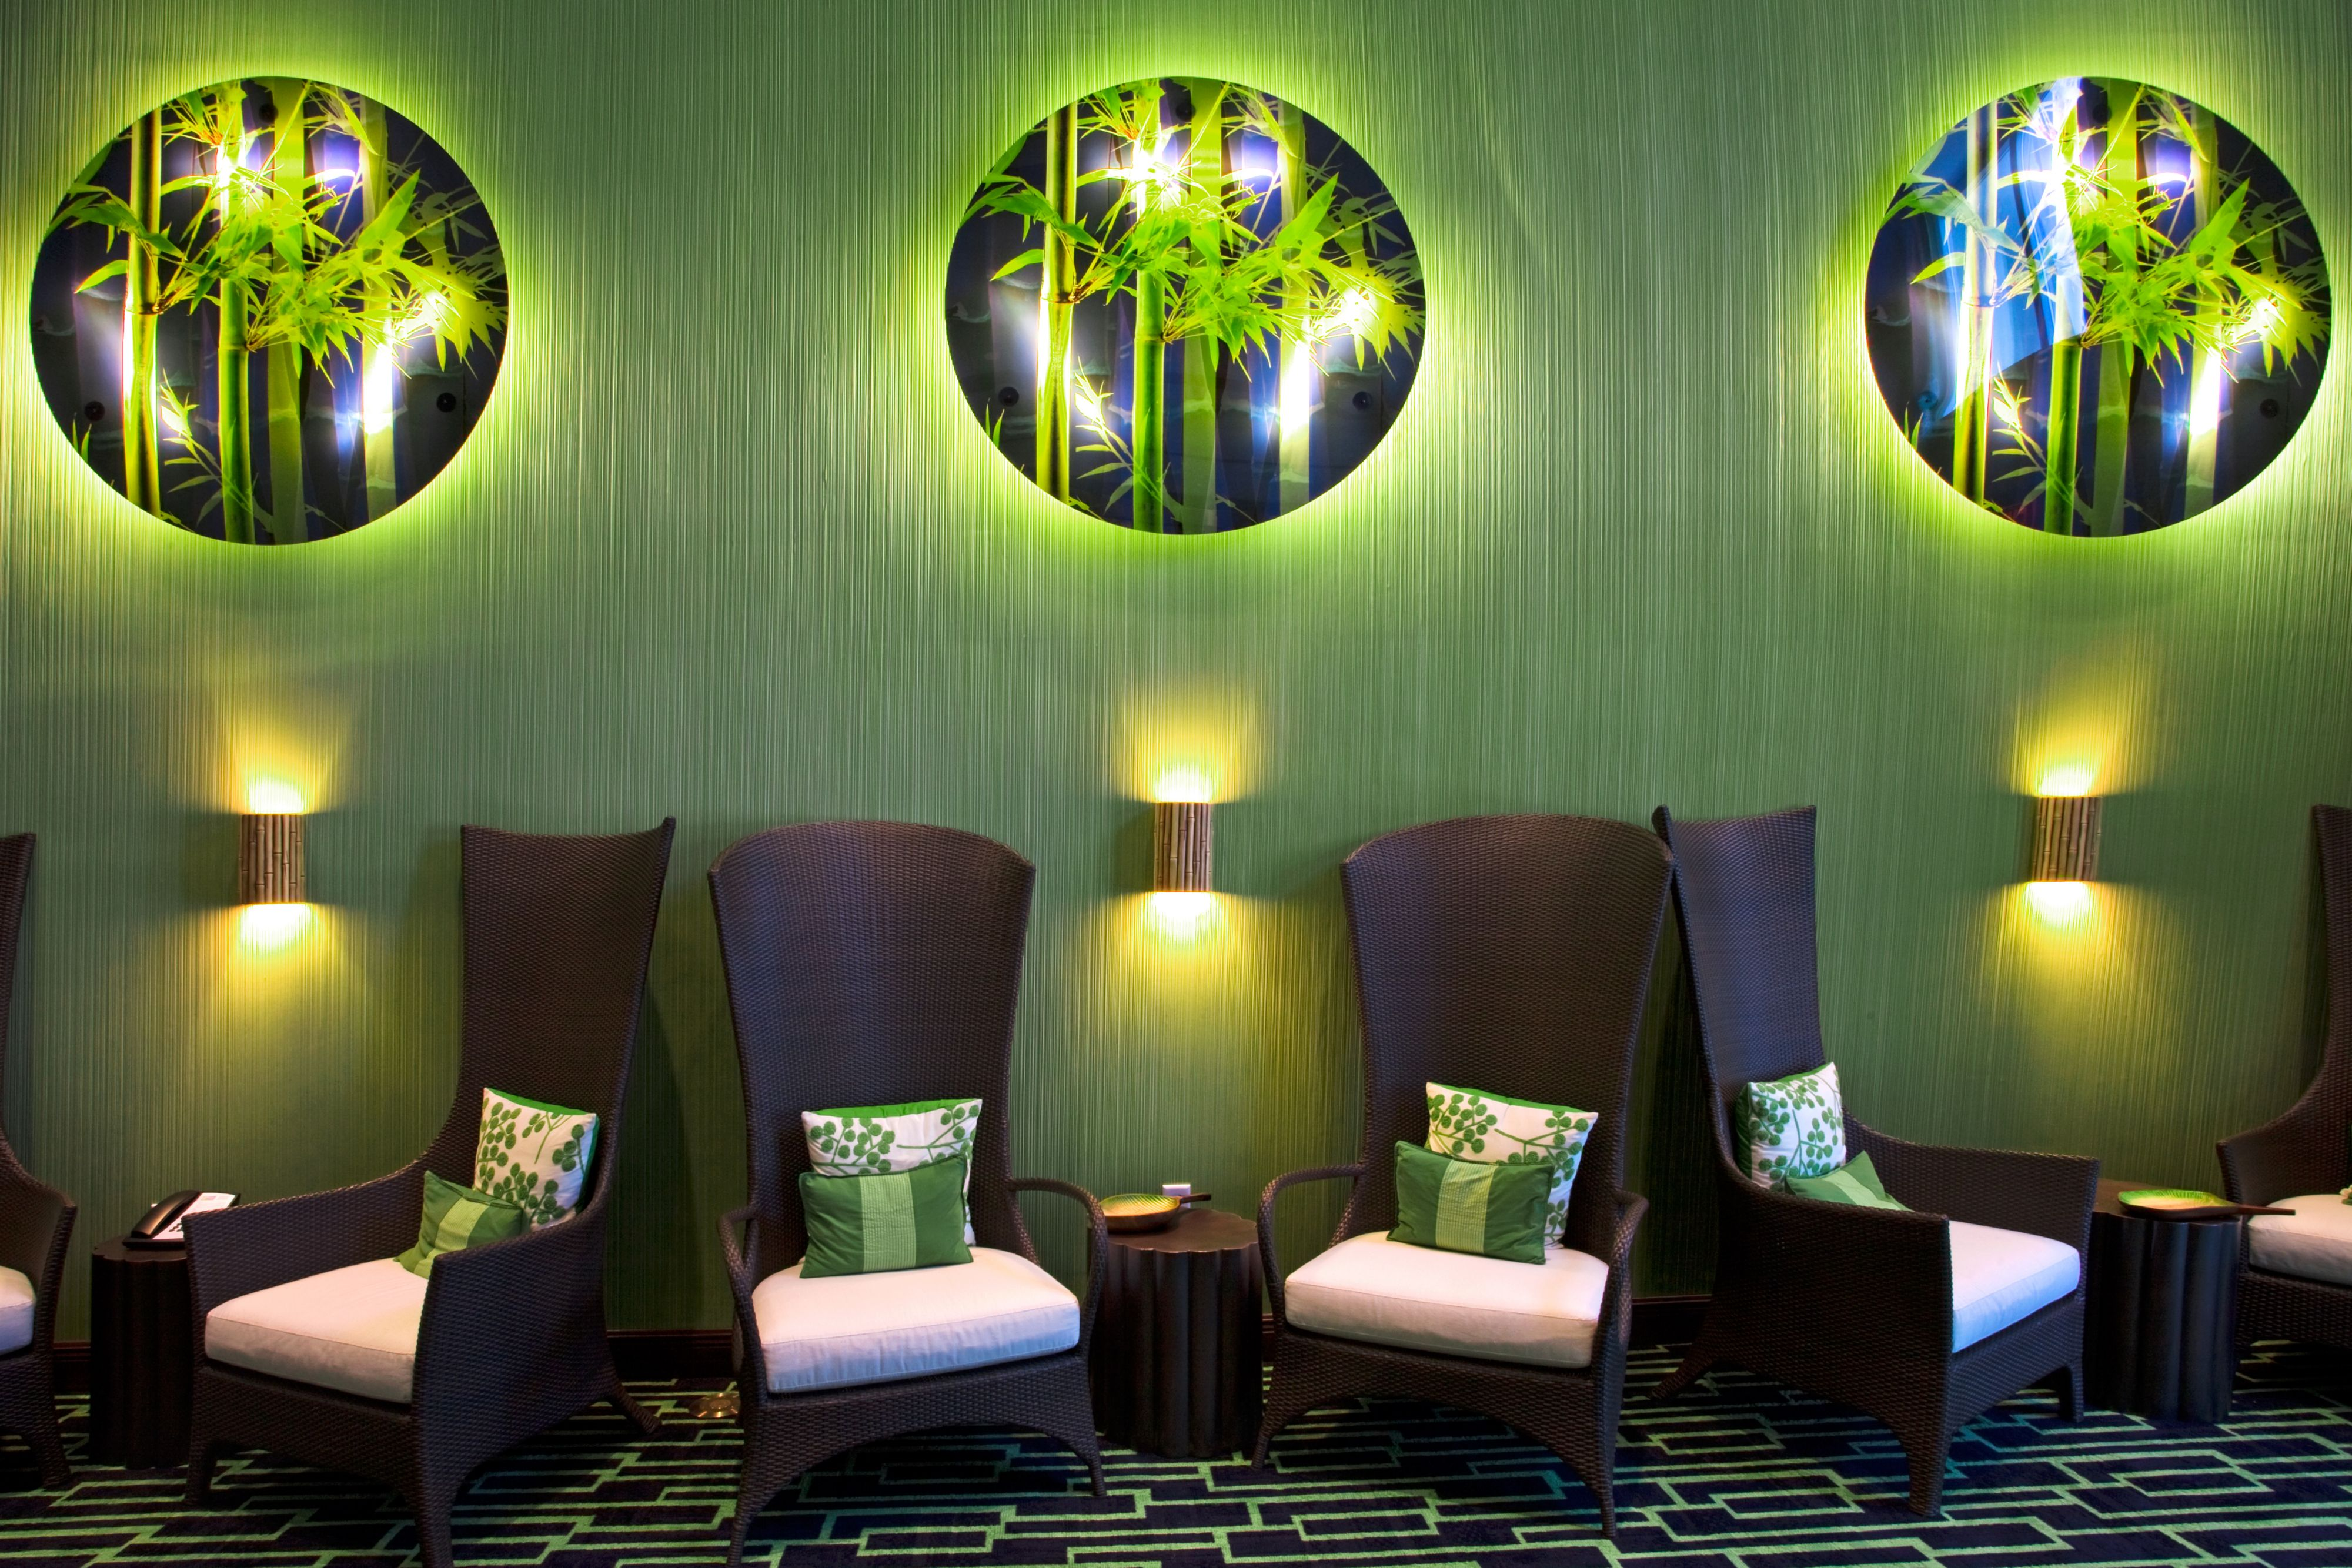 Holiday Inn Express & Suites Orlando - Apopka image 4